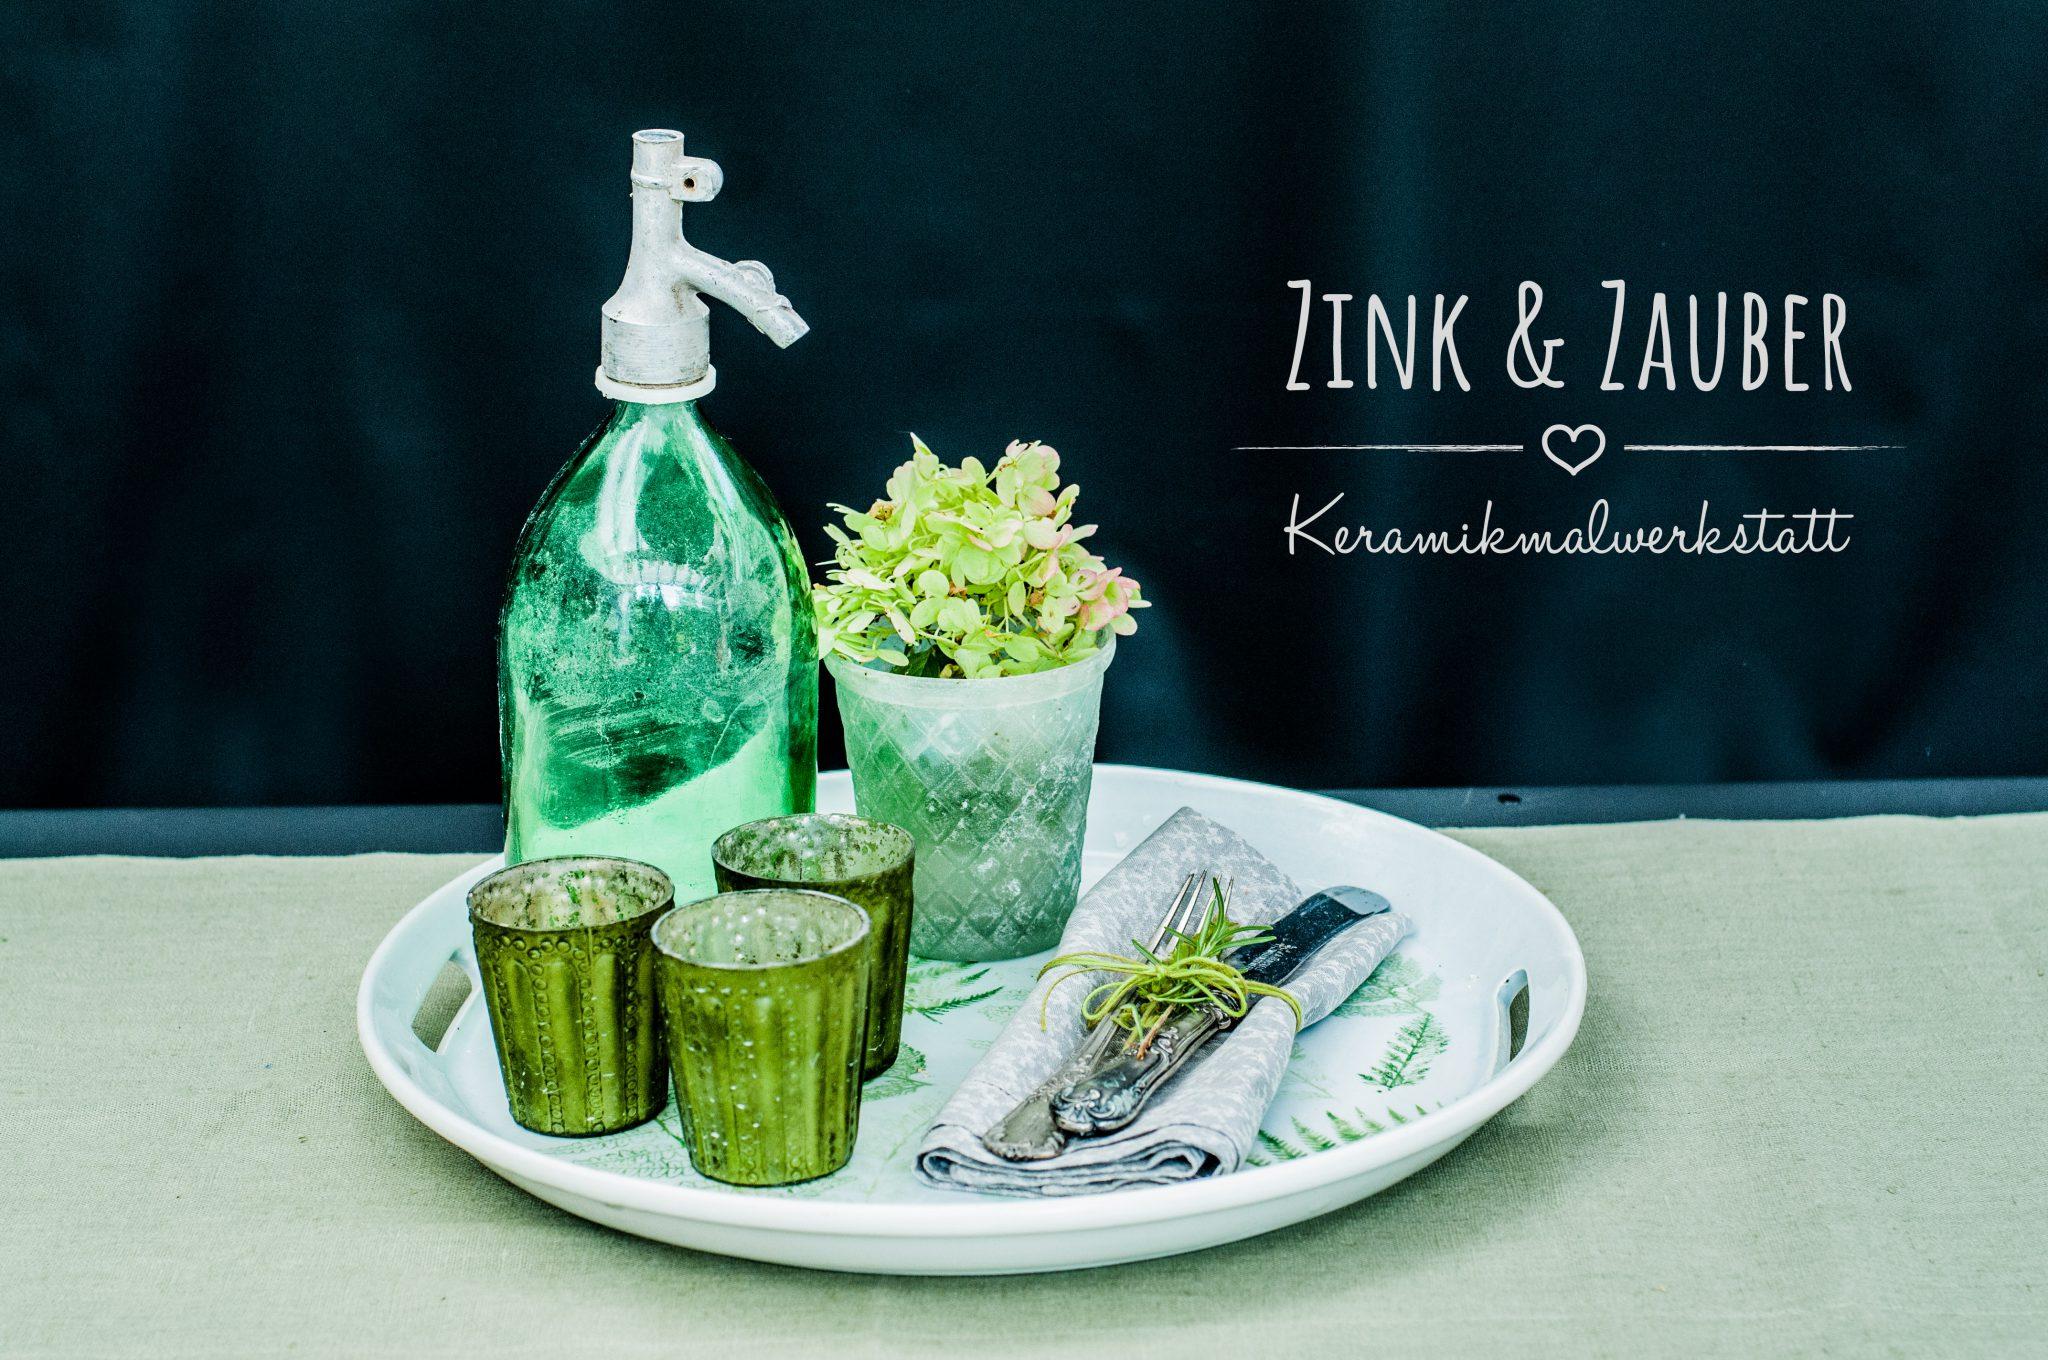 greenery der trend auf keramik zink zauber. Black Bedroom Furniture Sets. Home Design Ideas